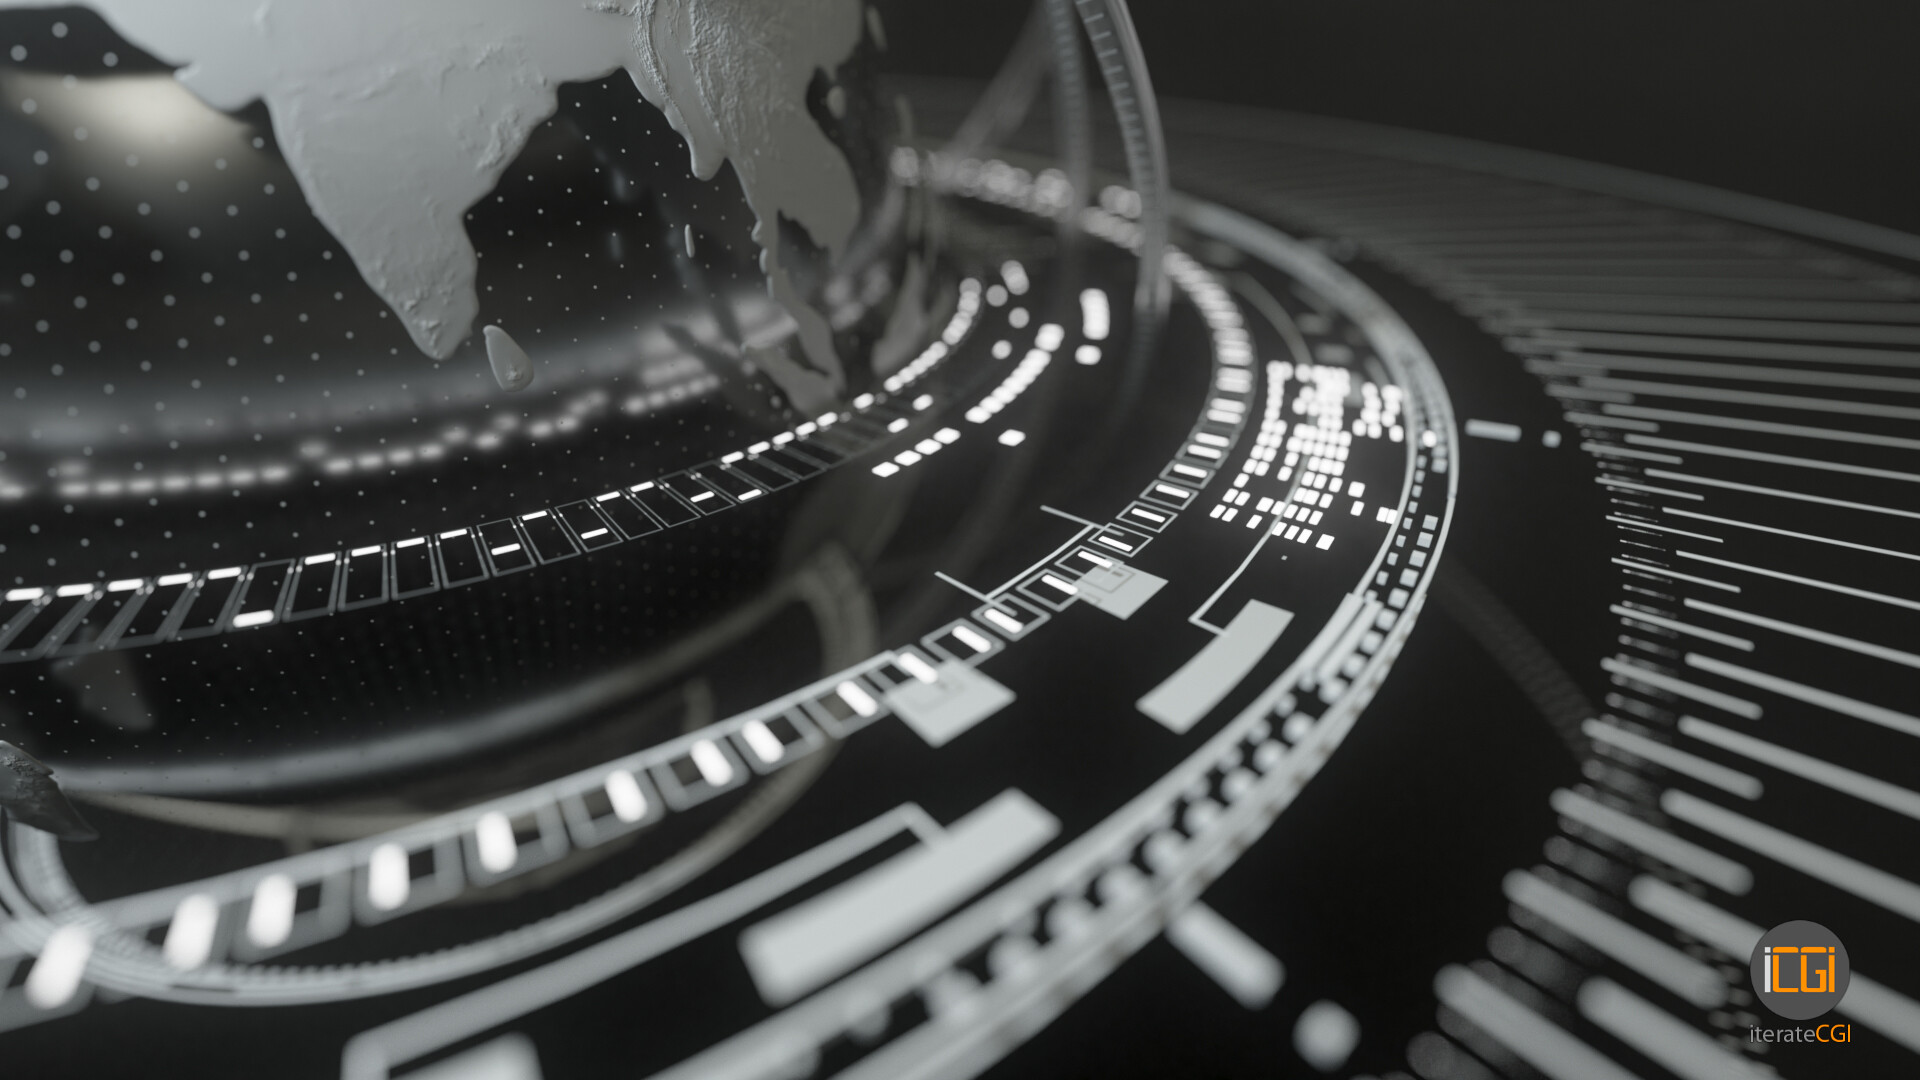 Johan de leenheer globe motion graphic 7